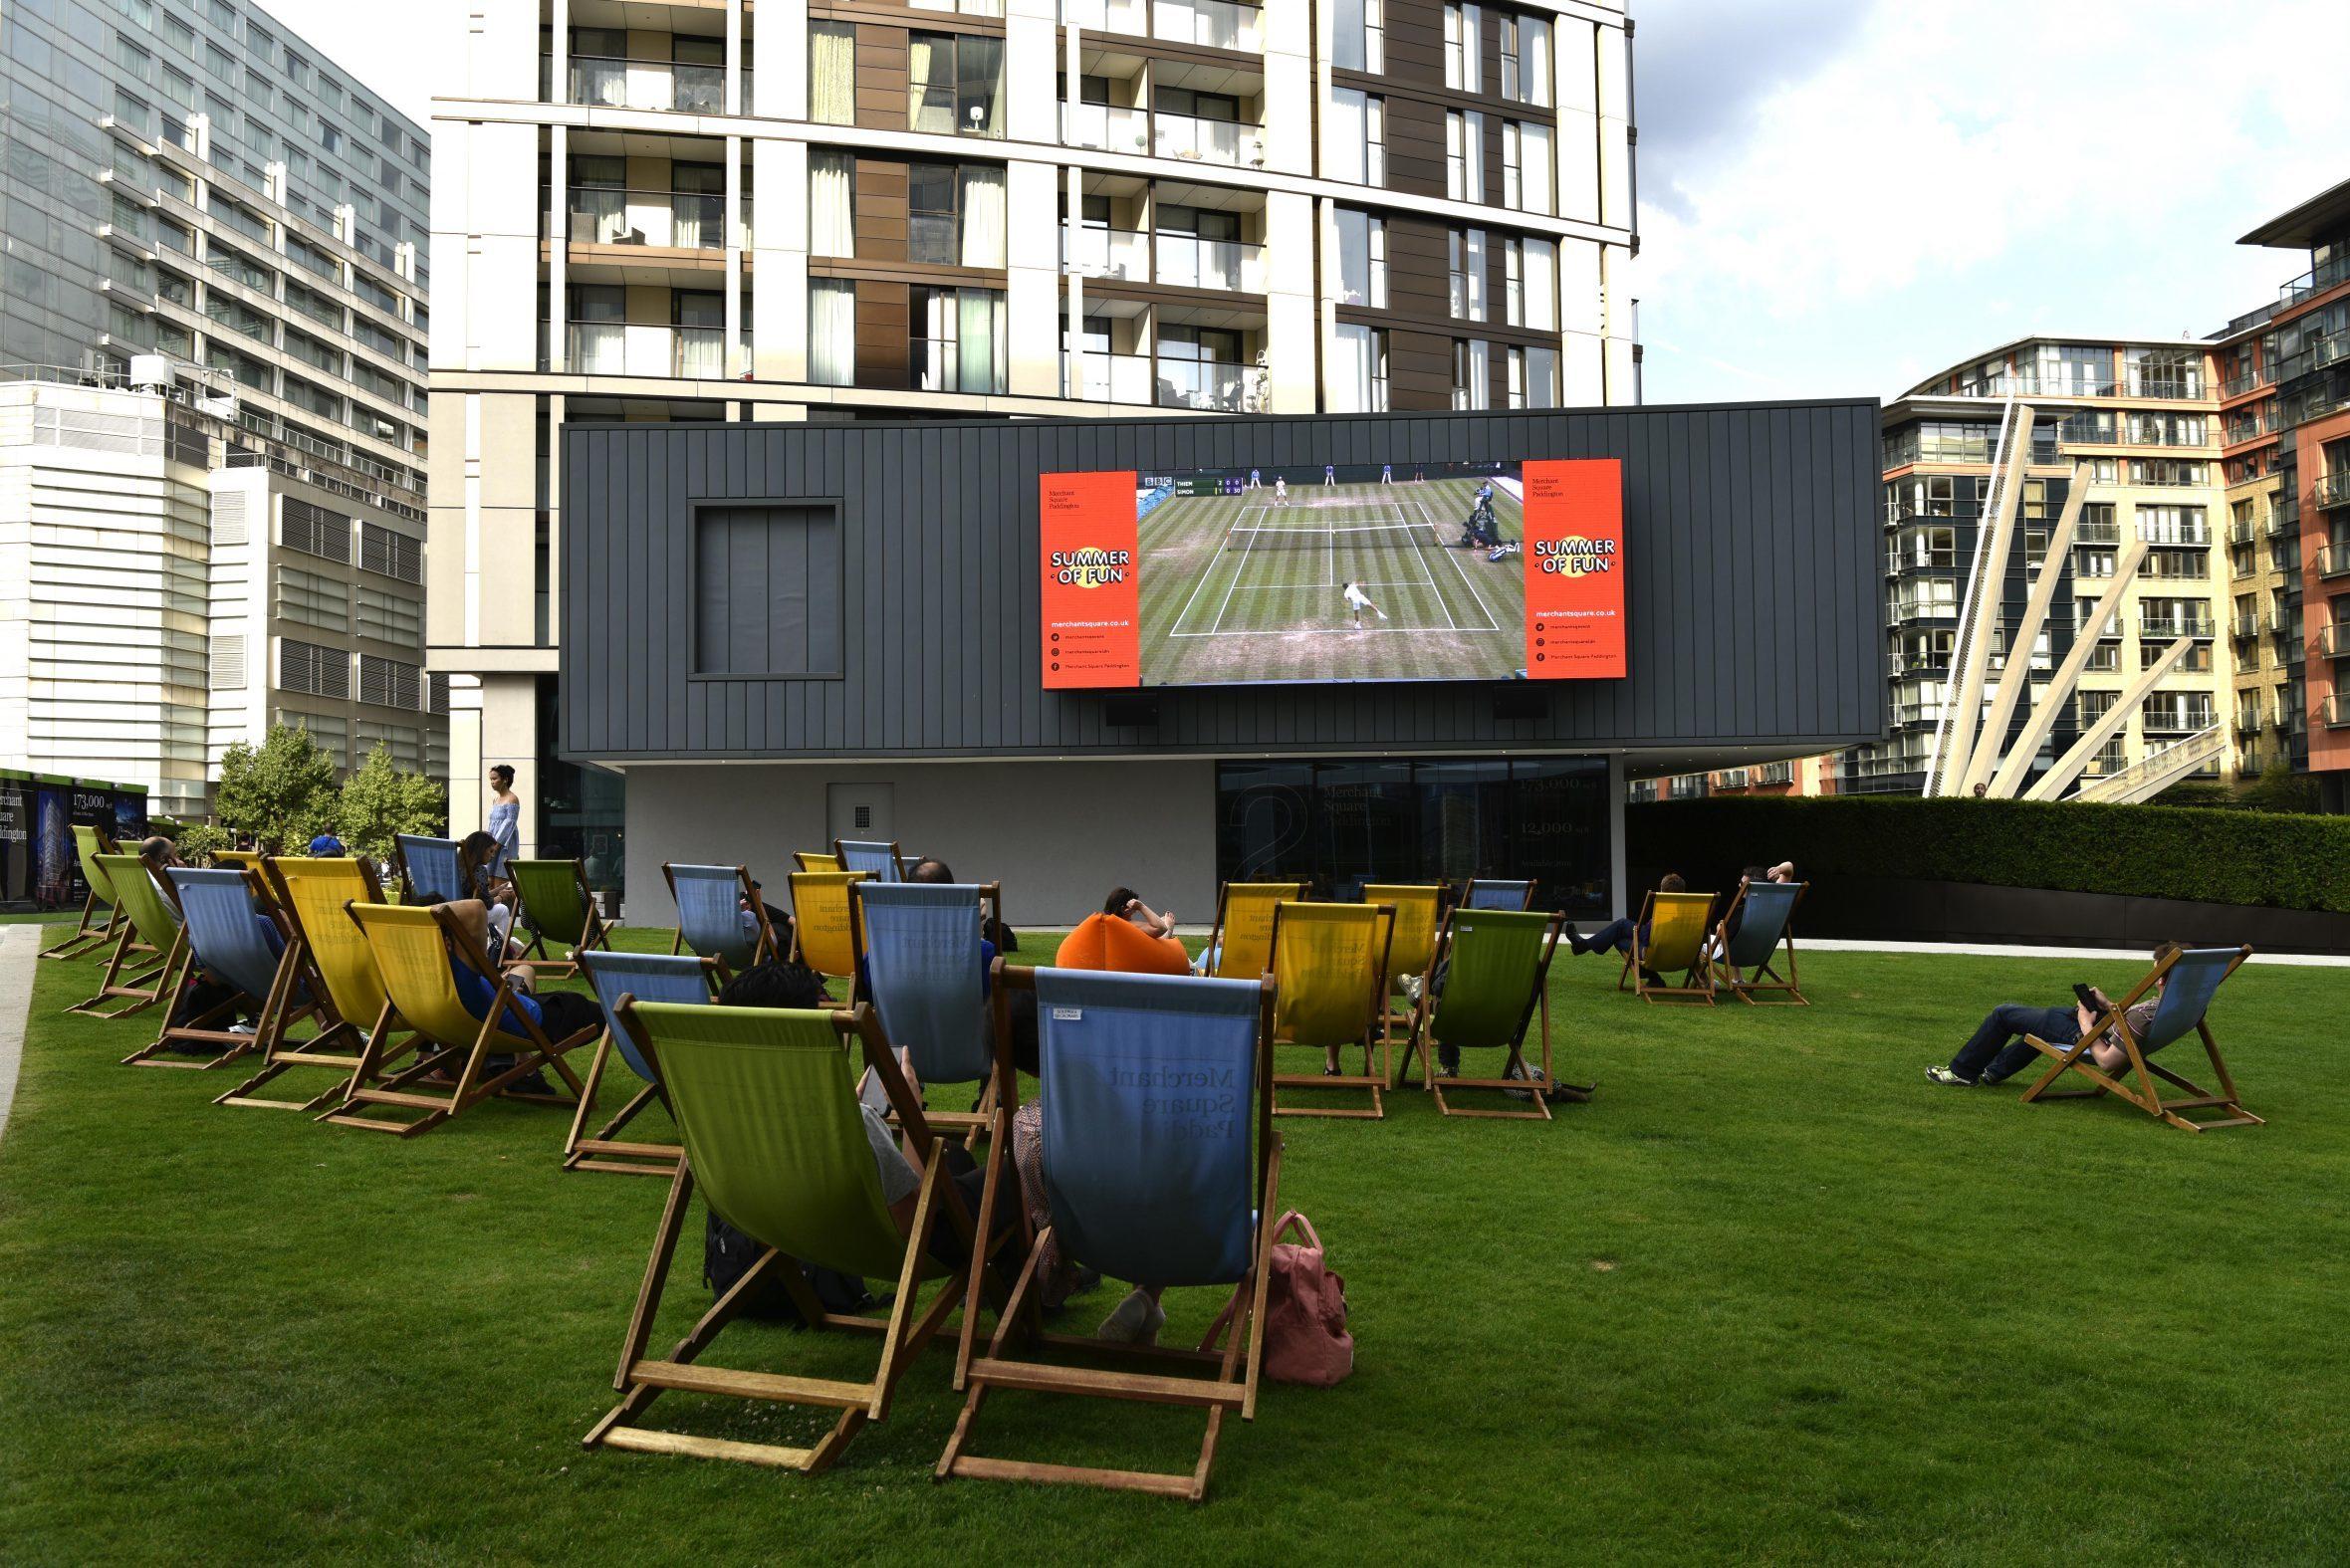 The Big Screen at Merchant Square